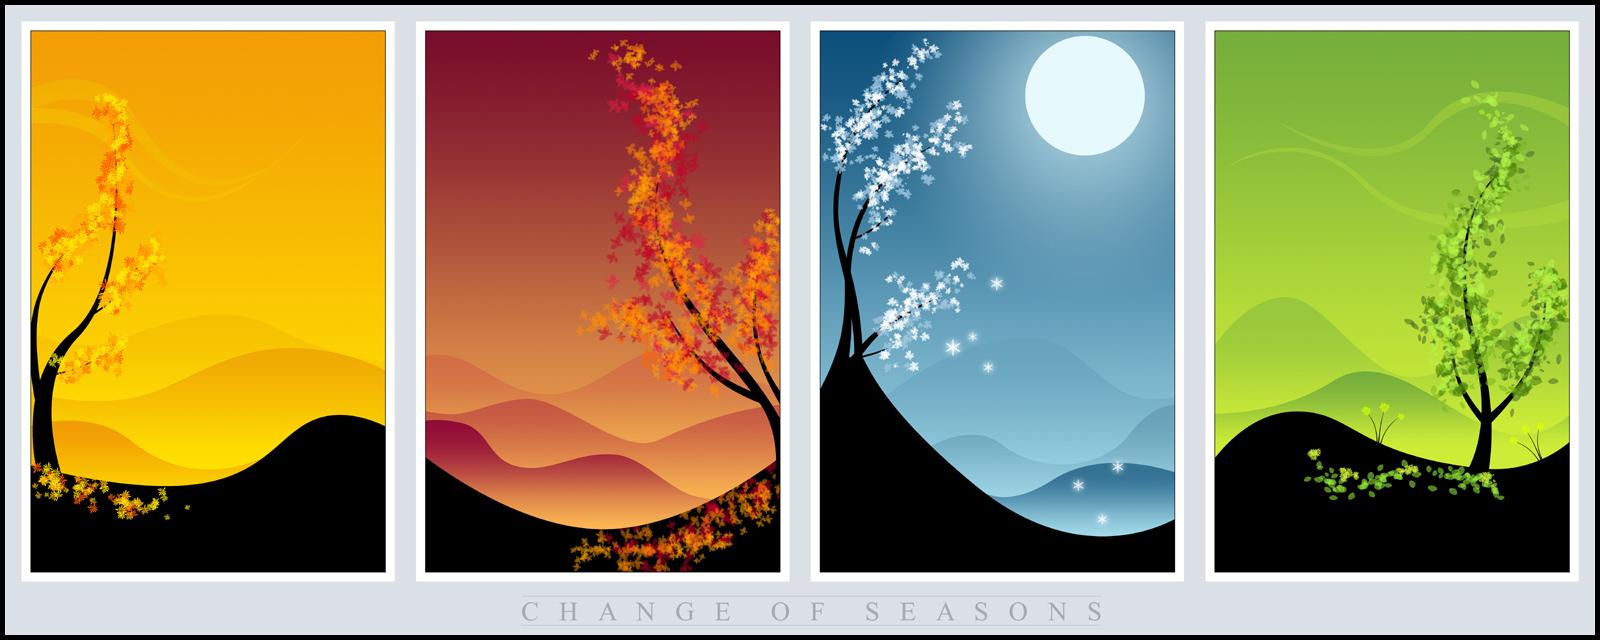 High Resolution Wallpaper | Season 1600x640 px